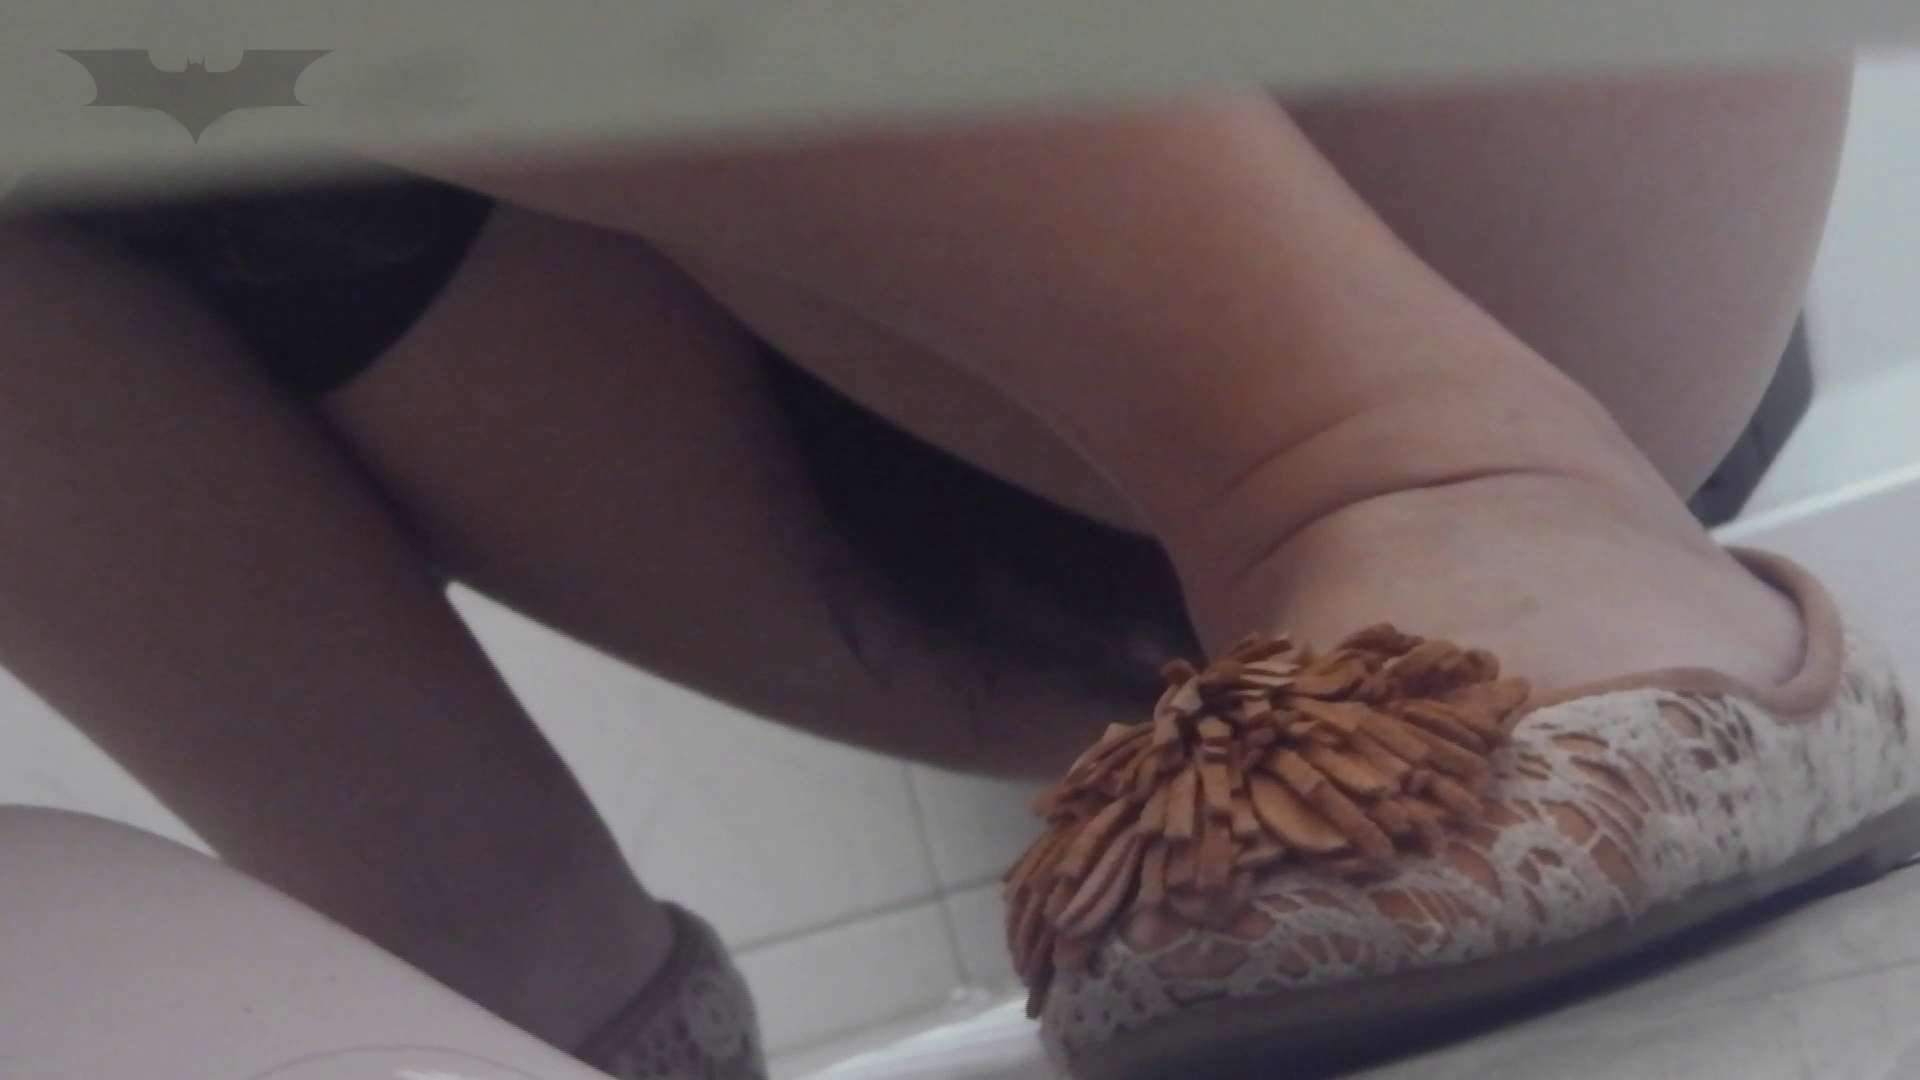 潜入!!台湾名門女学院 Vol.02 必見!中腰で「大」途中筋力の限界に・・・。 OLの実態 盗撮動画紹介 101pic 78